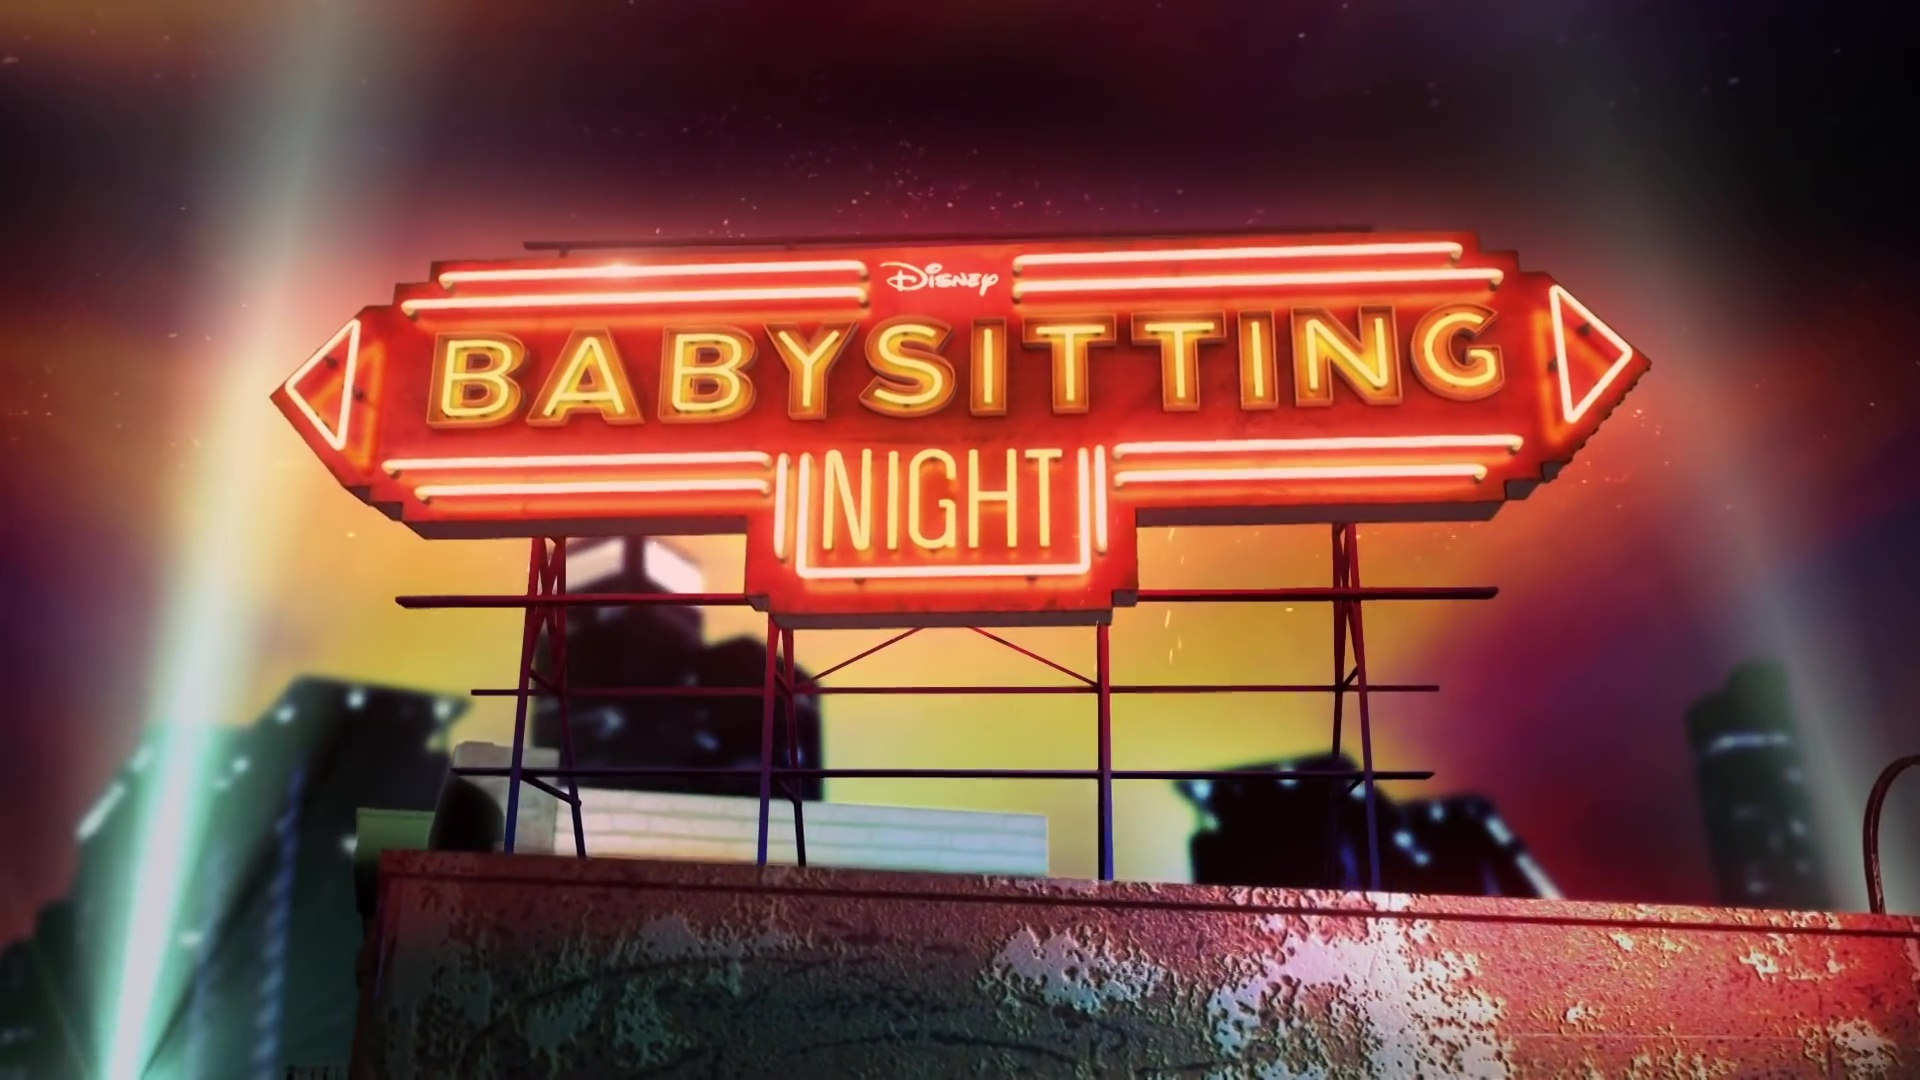 Disney actu trailer babysitting night